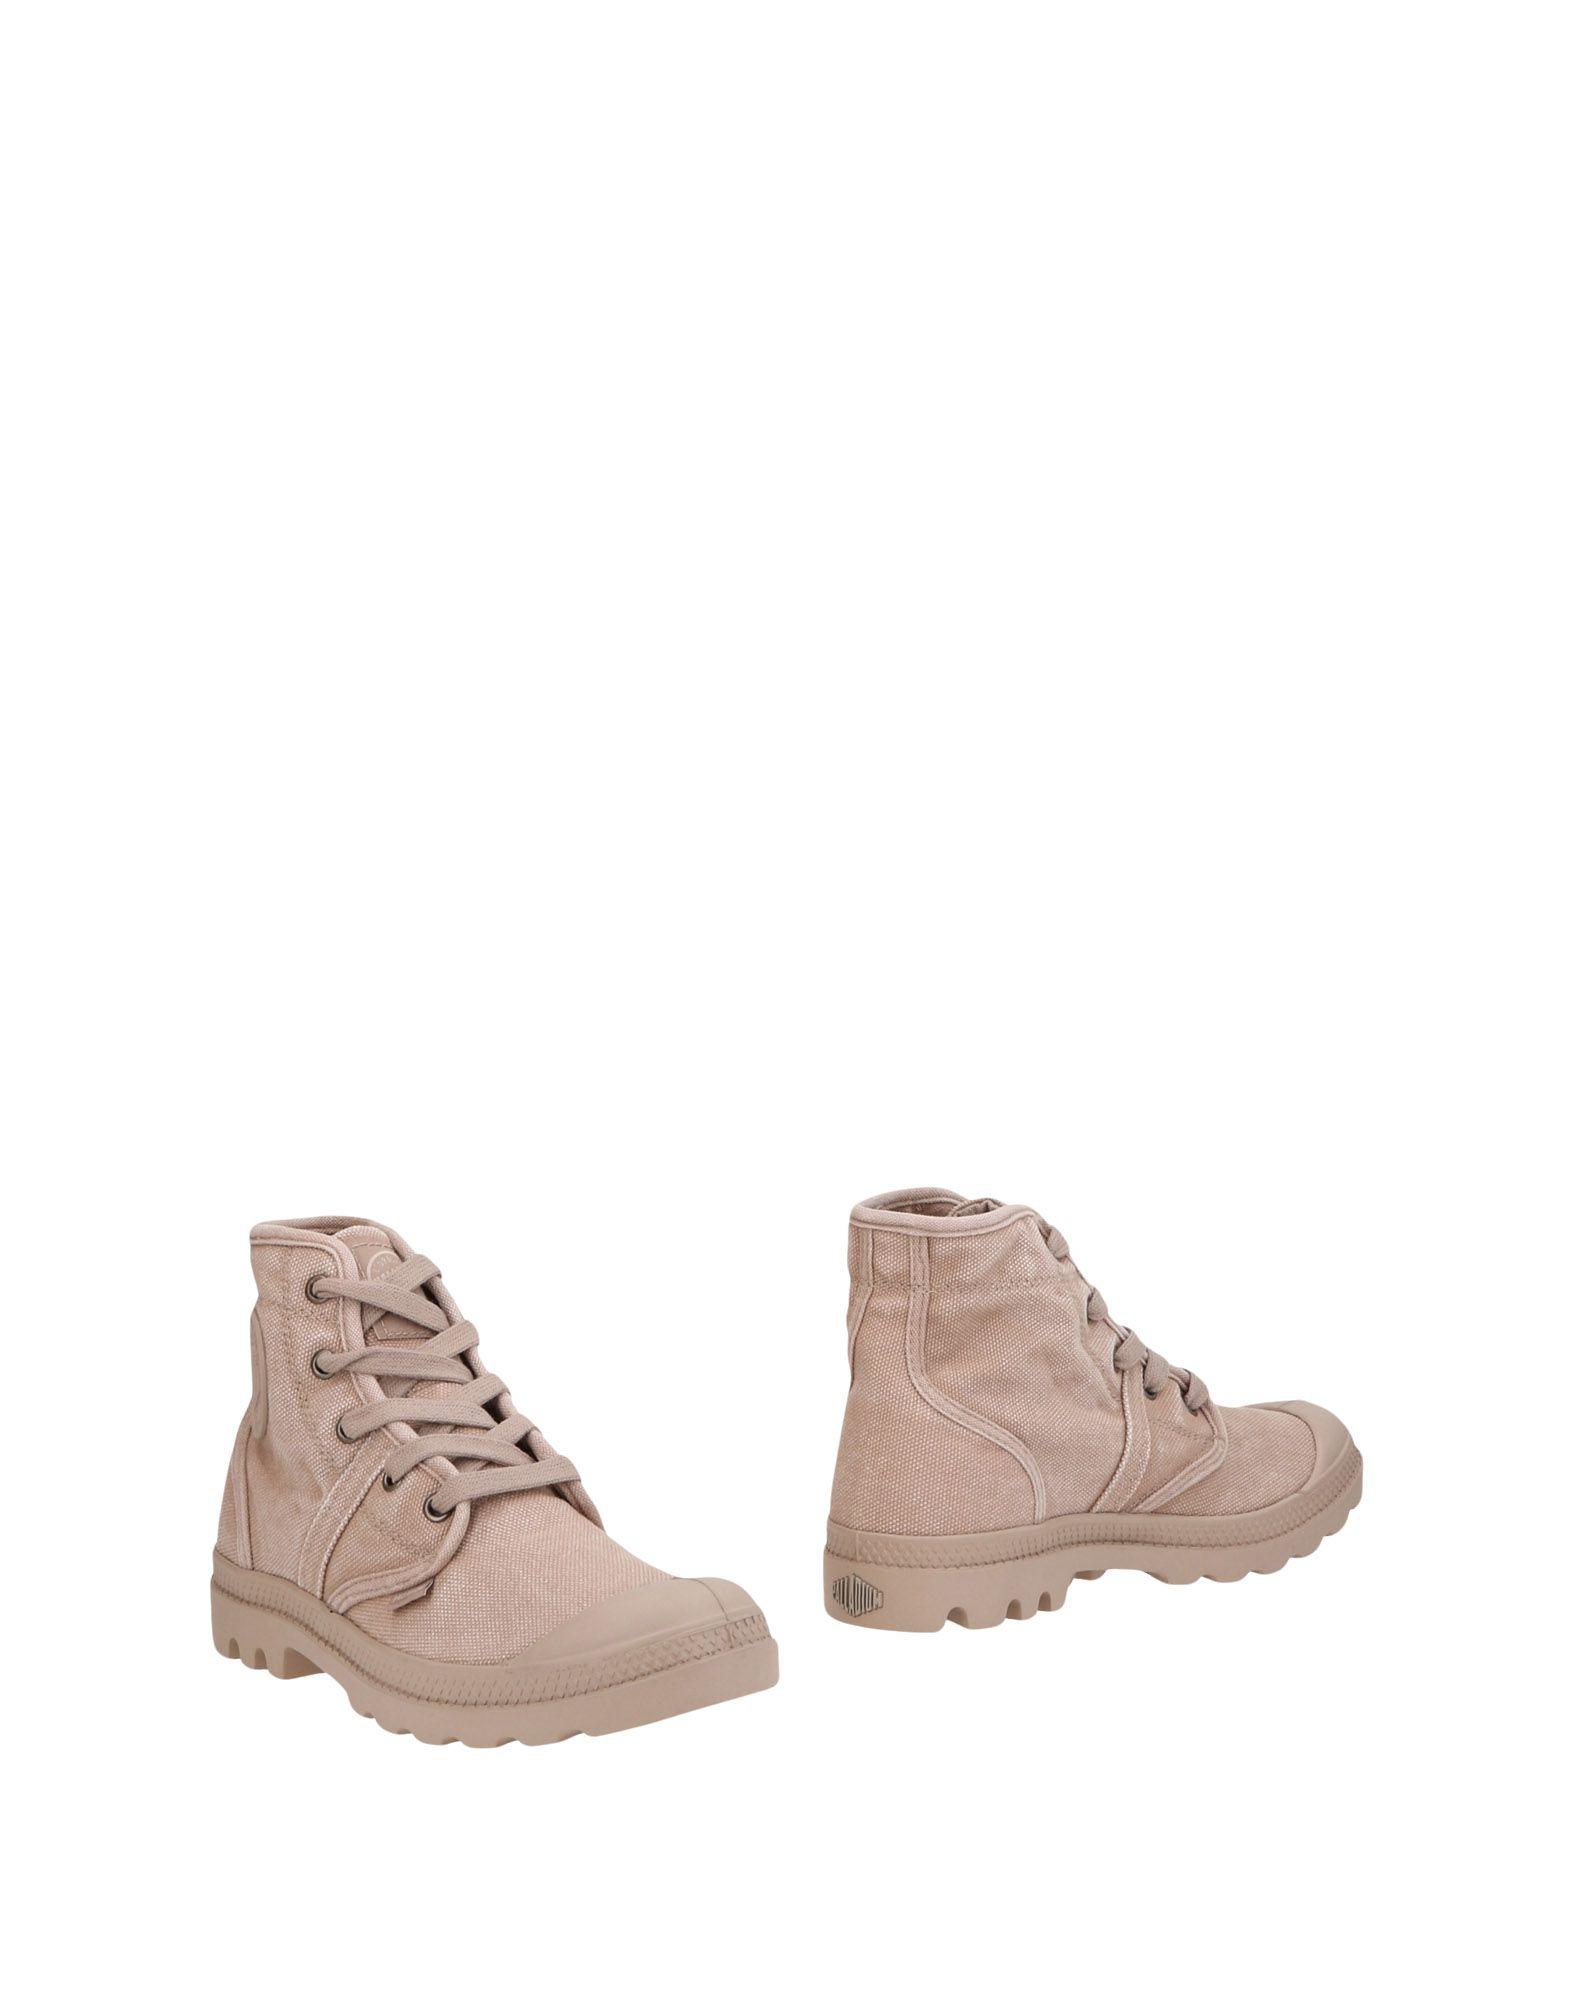 PALLADIUM Ankle Boot in Dove Grey